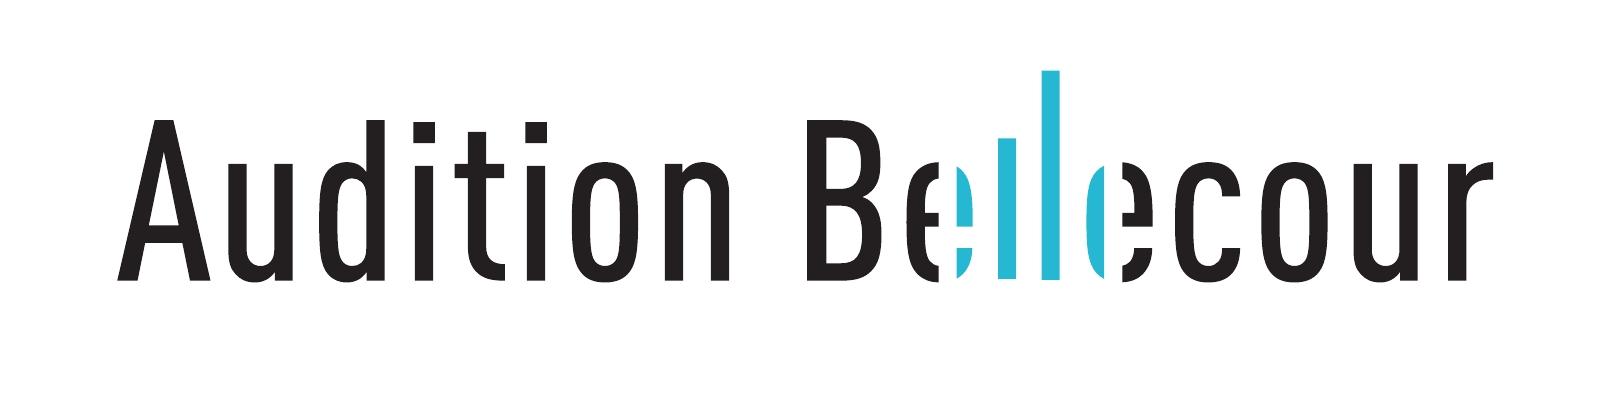 AUDITION BELLECOUR